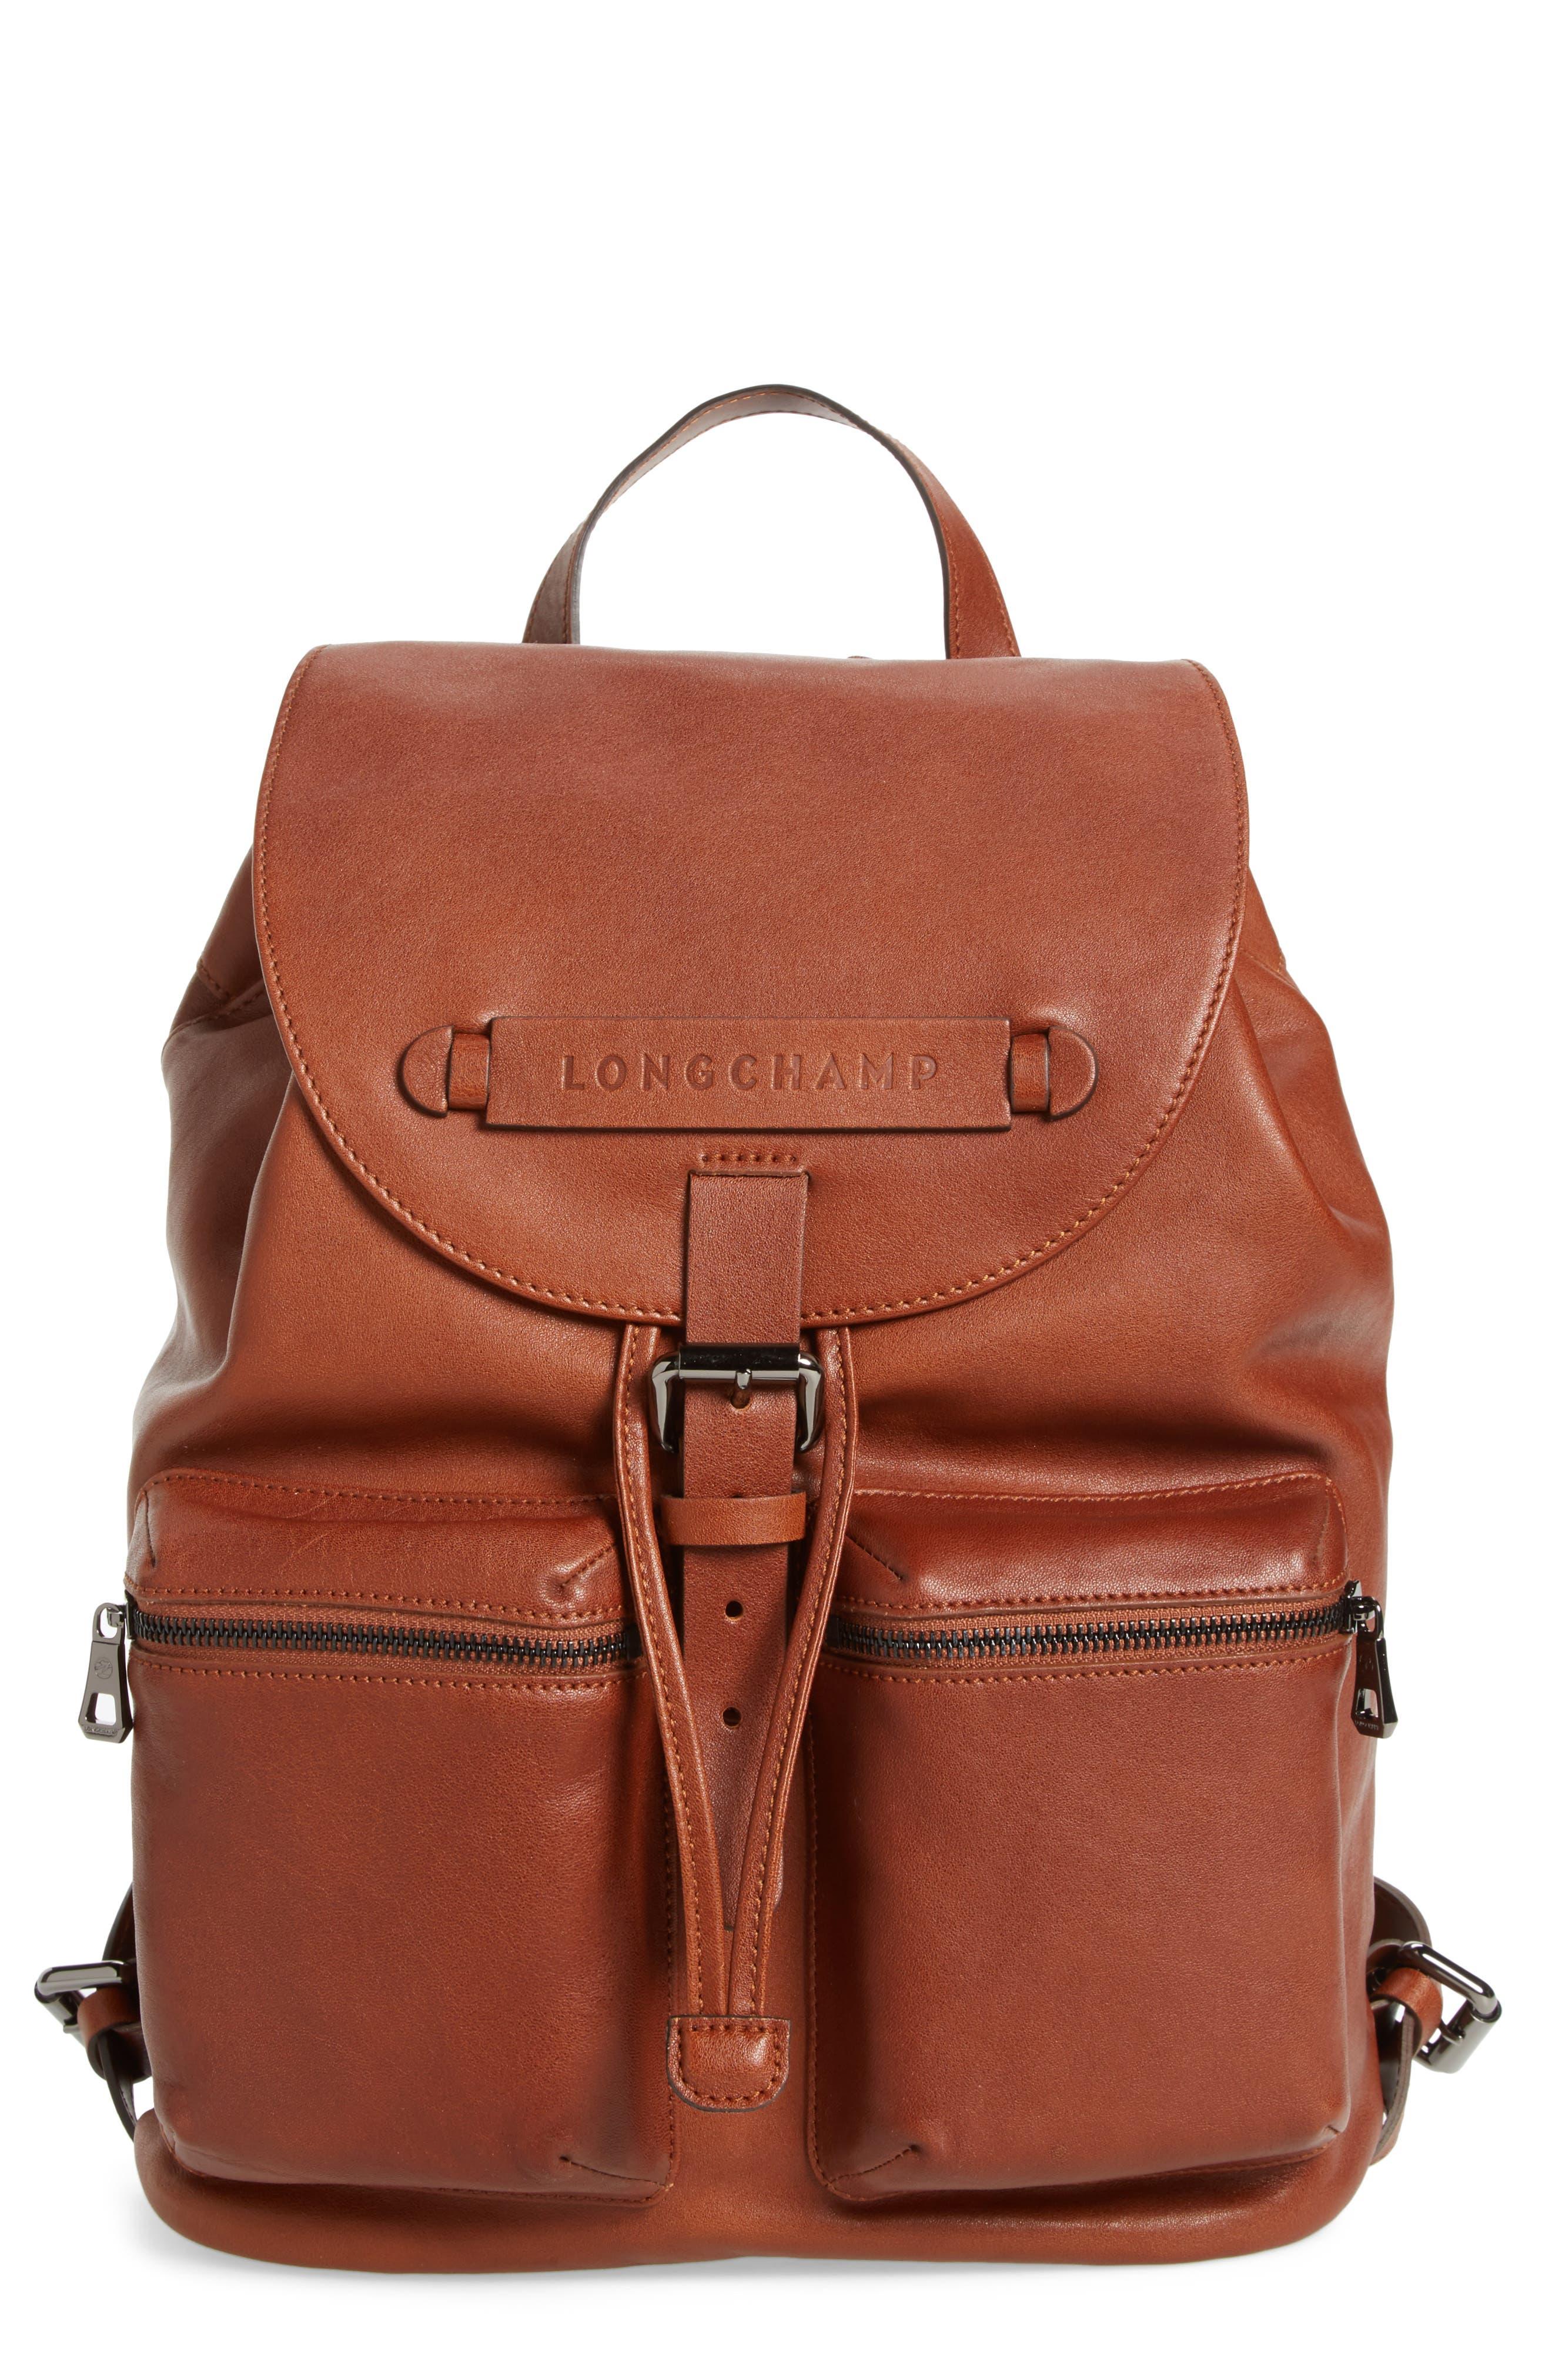 LONGCHAMP Medium 3D Leather Backpack